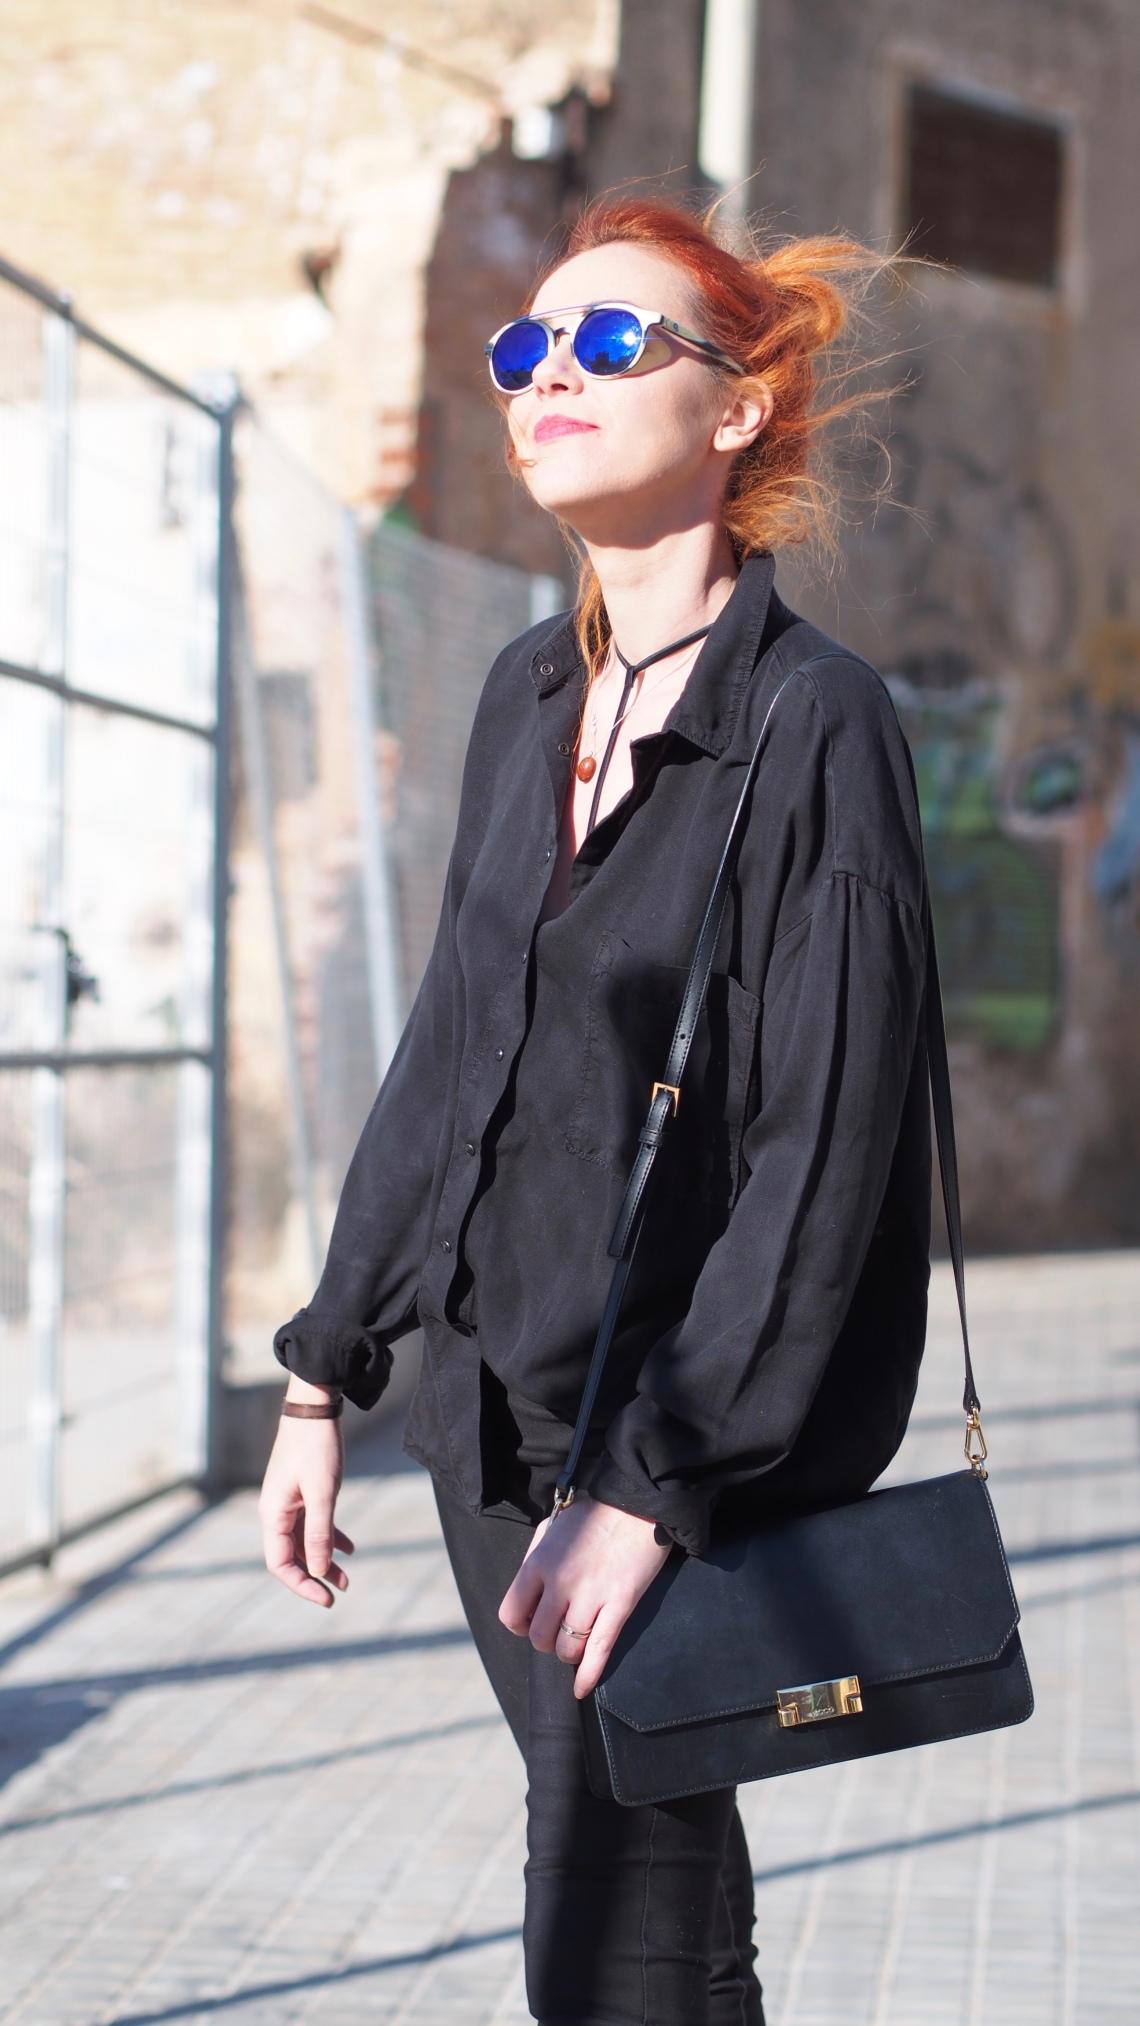 camisa negra chica streetstyle